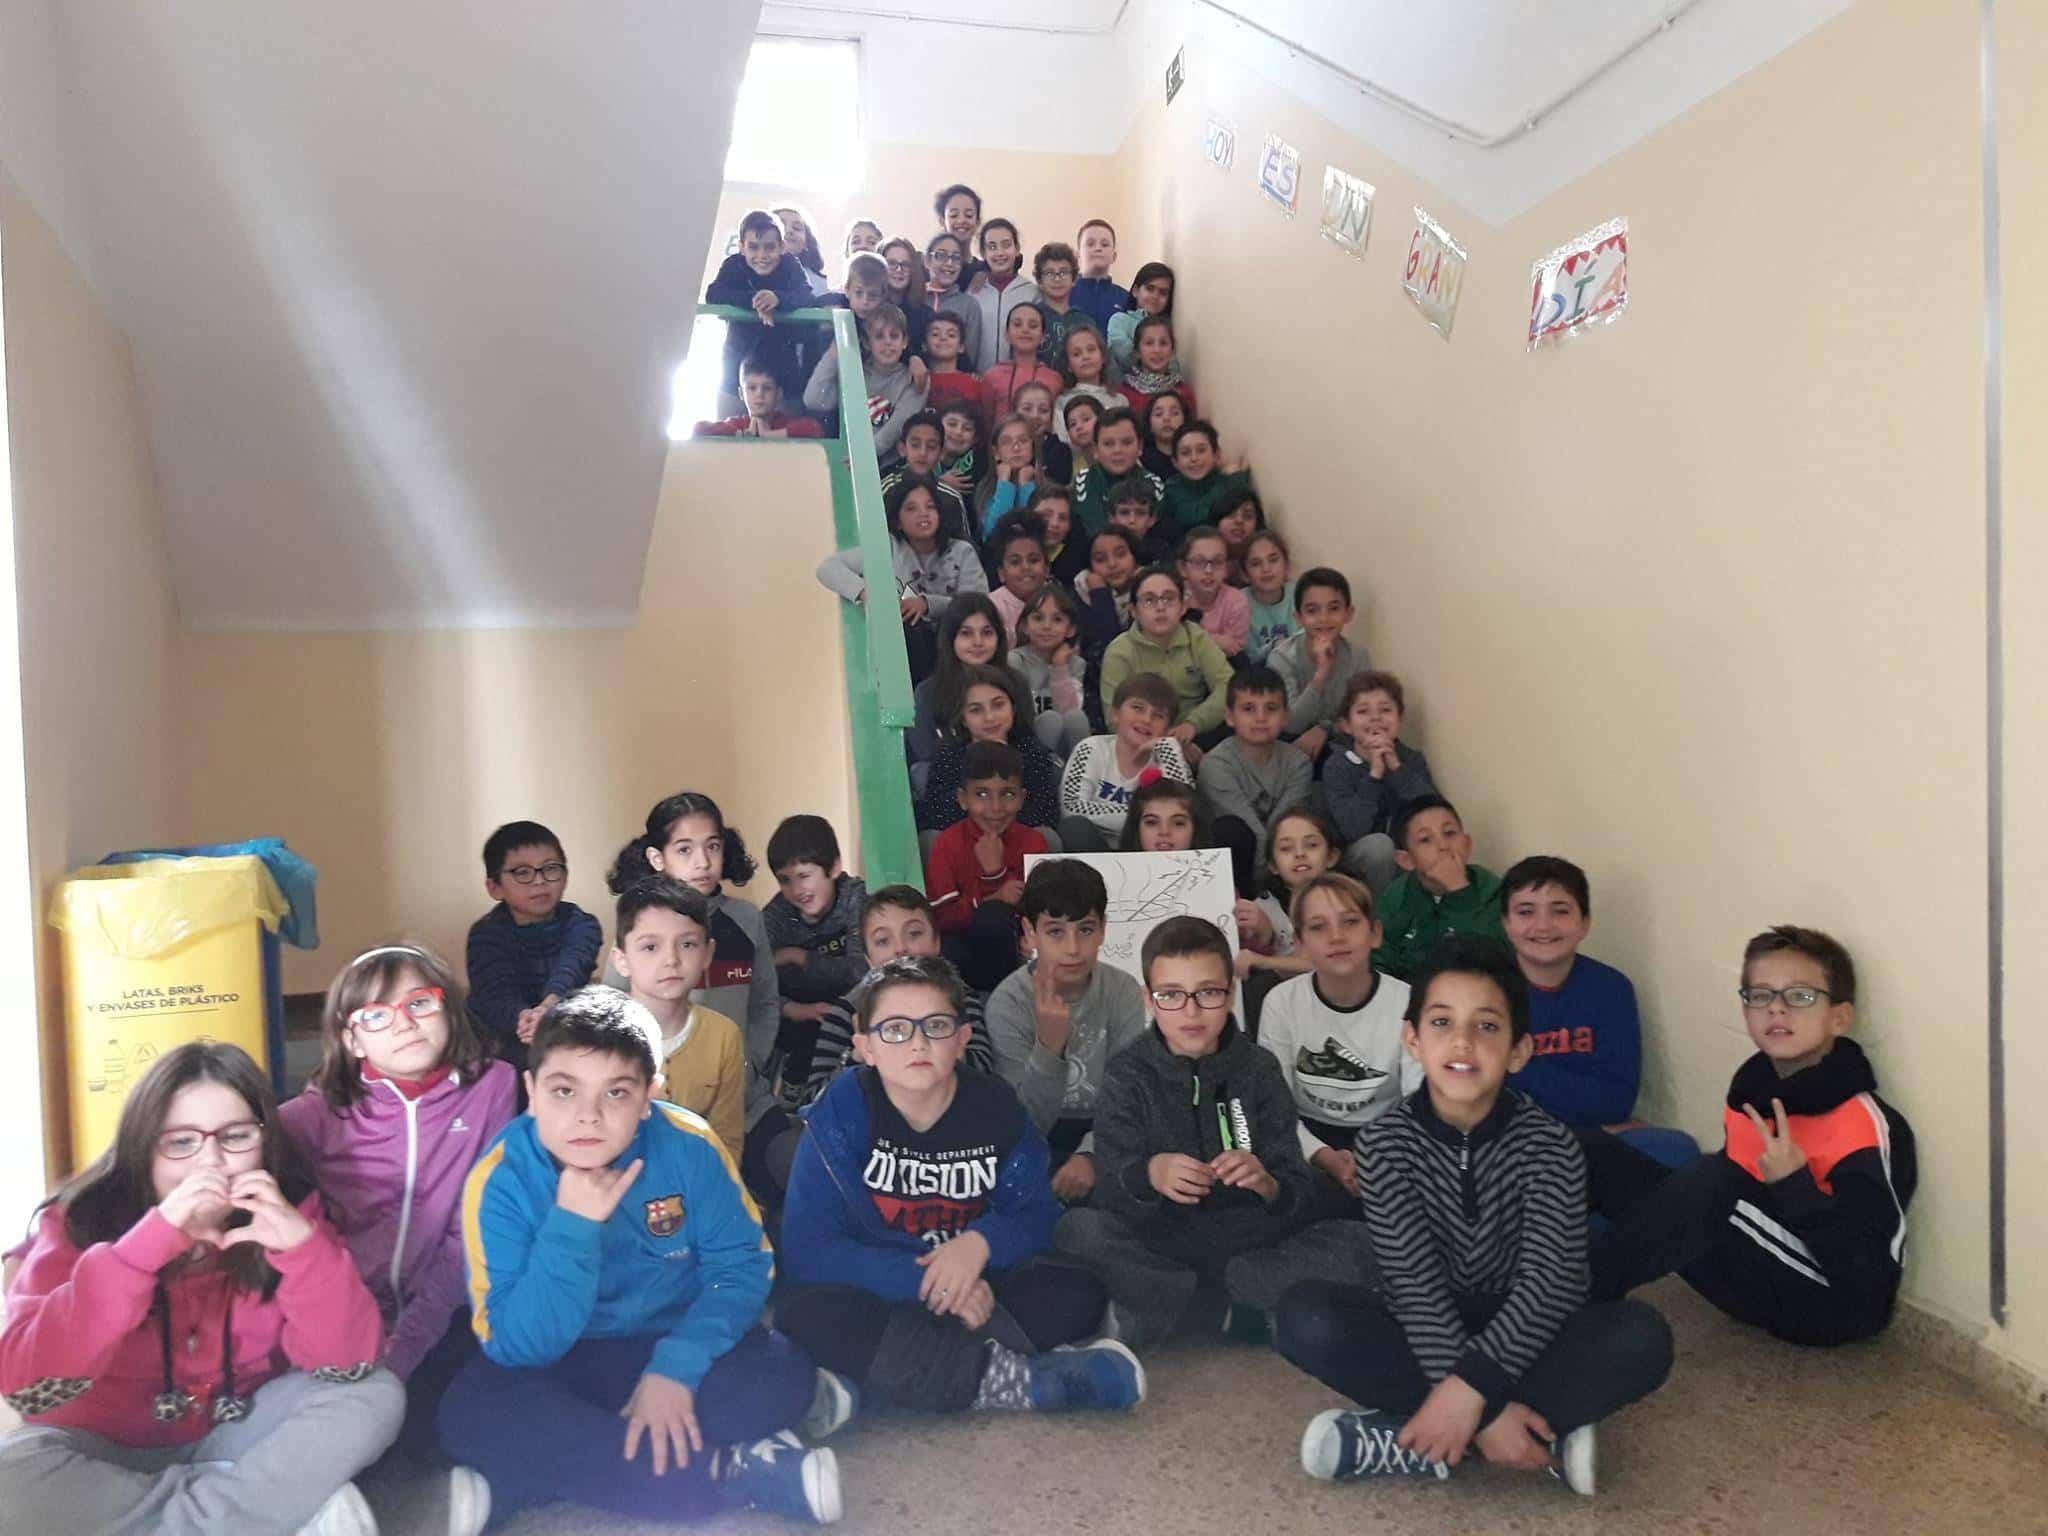 radio escolar ceip carrasco alcalde herencia - La radio escolar del CEIP Carrasco Alcalde lanzó su programa 3: ¿Qué se cuece?